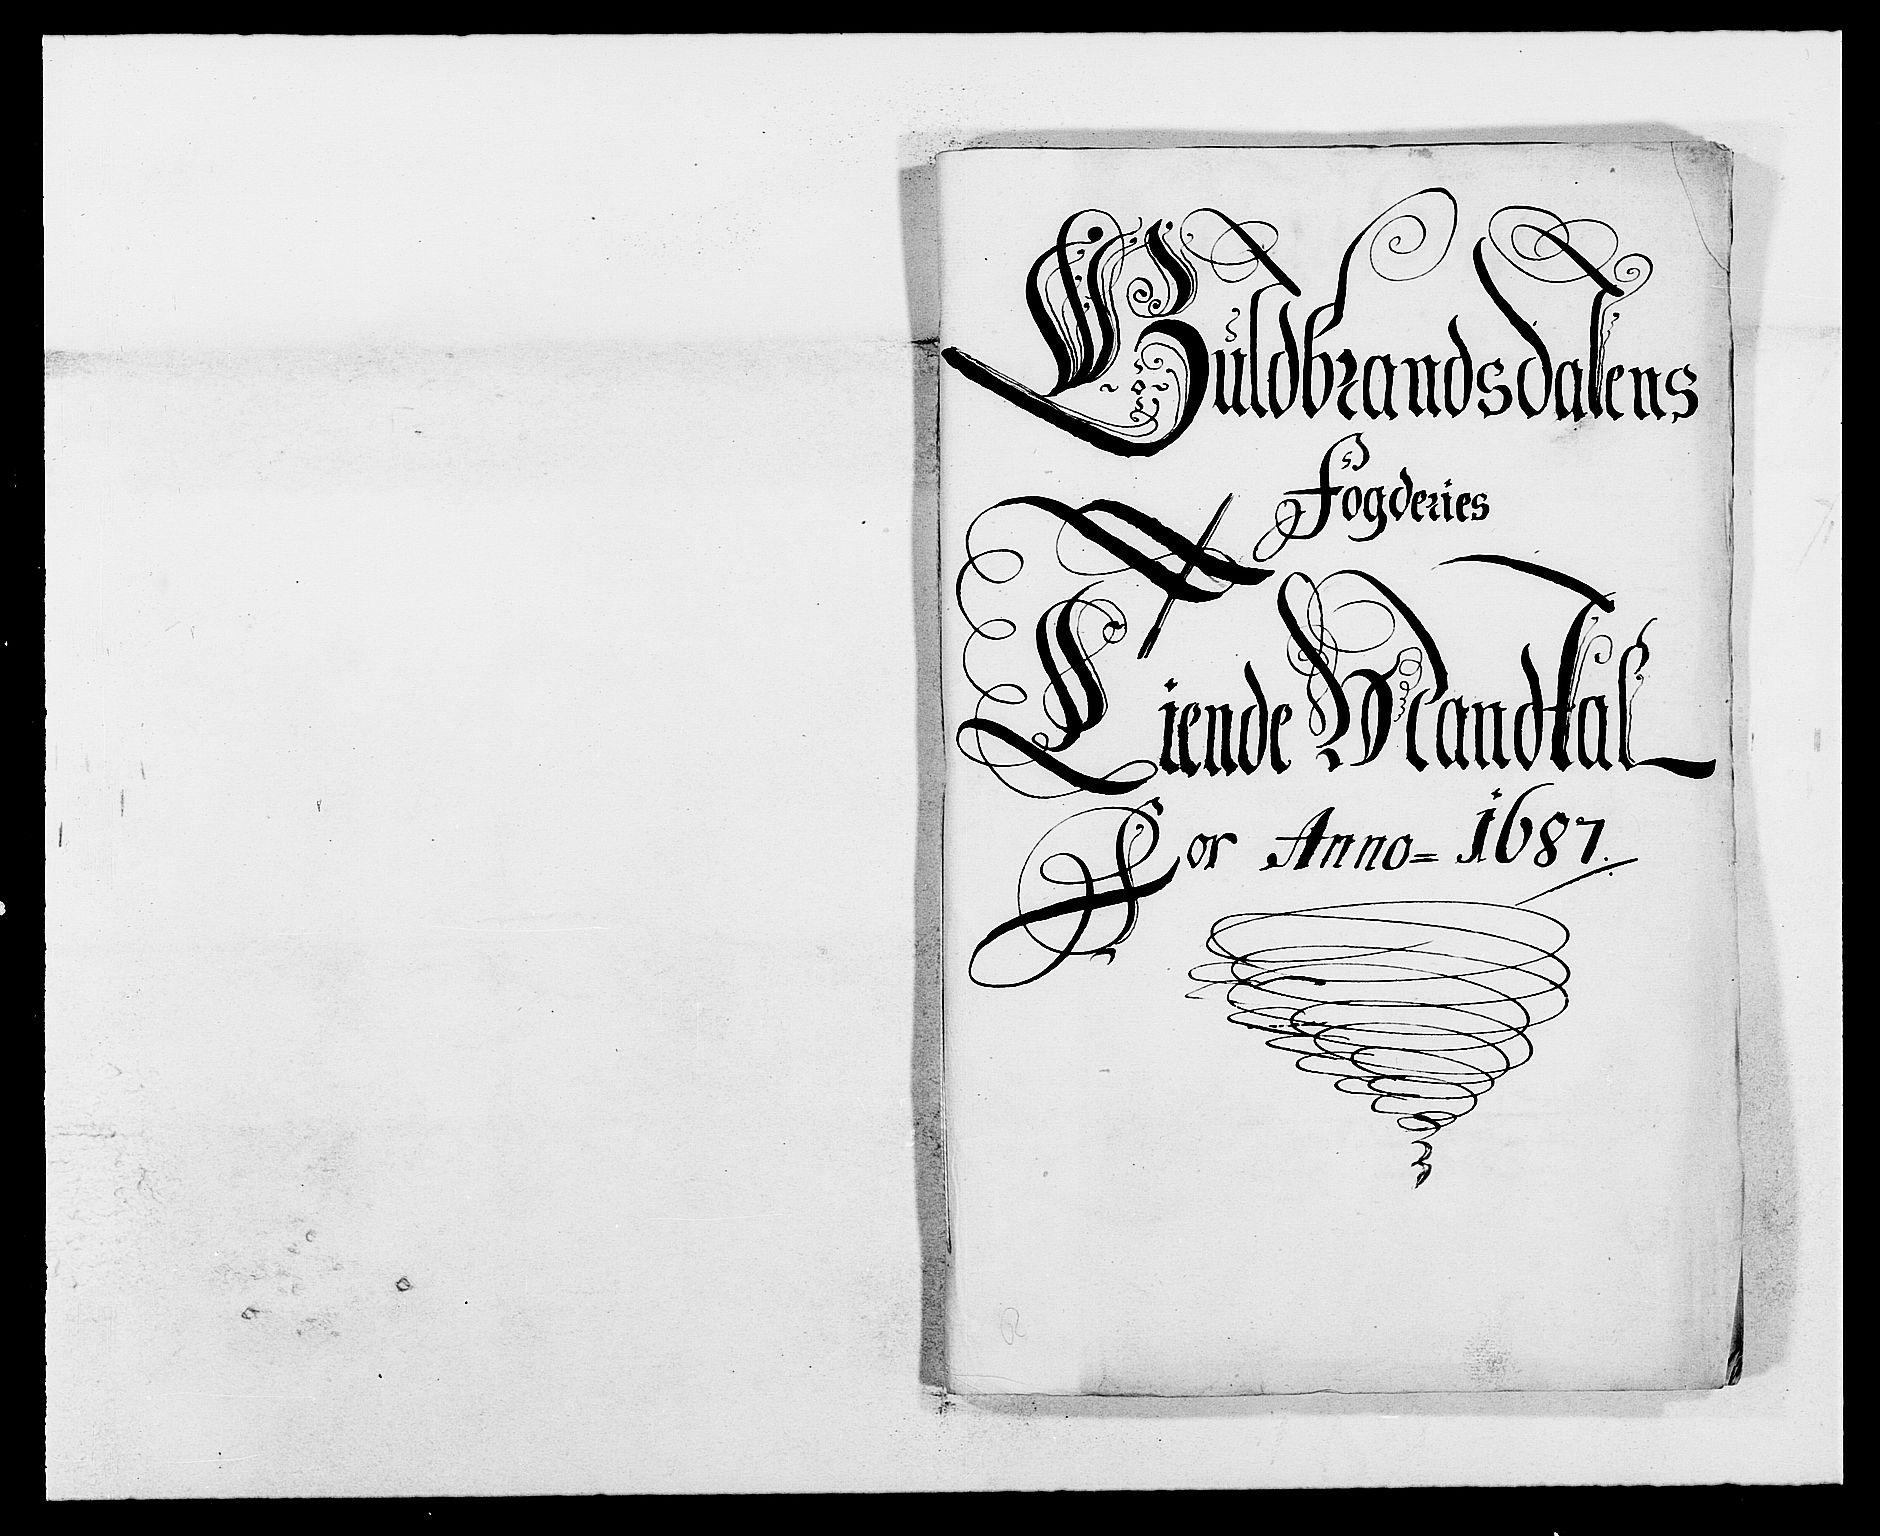 RA, Rentekammeret inntil 1814, Reviderte regnskaper, Fogderegnskap, R17/L1162: Fogderegnskap Gudbrandsdal, 1682-1689, s. 44